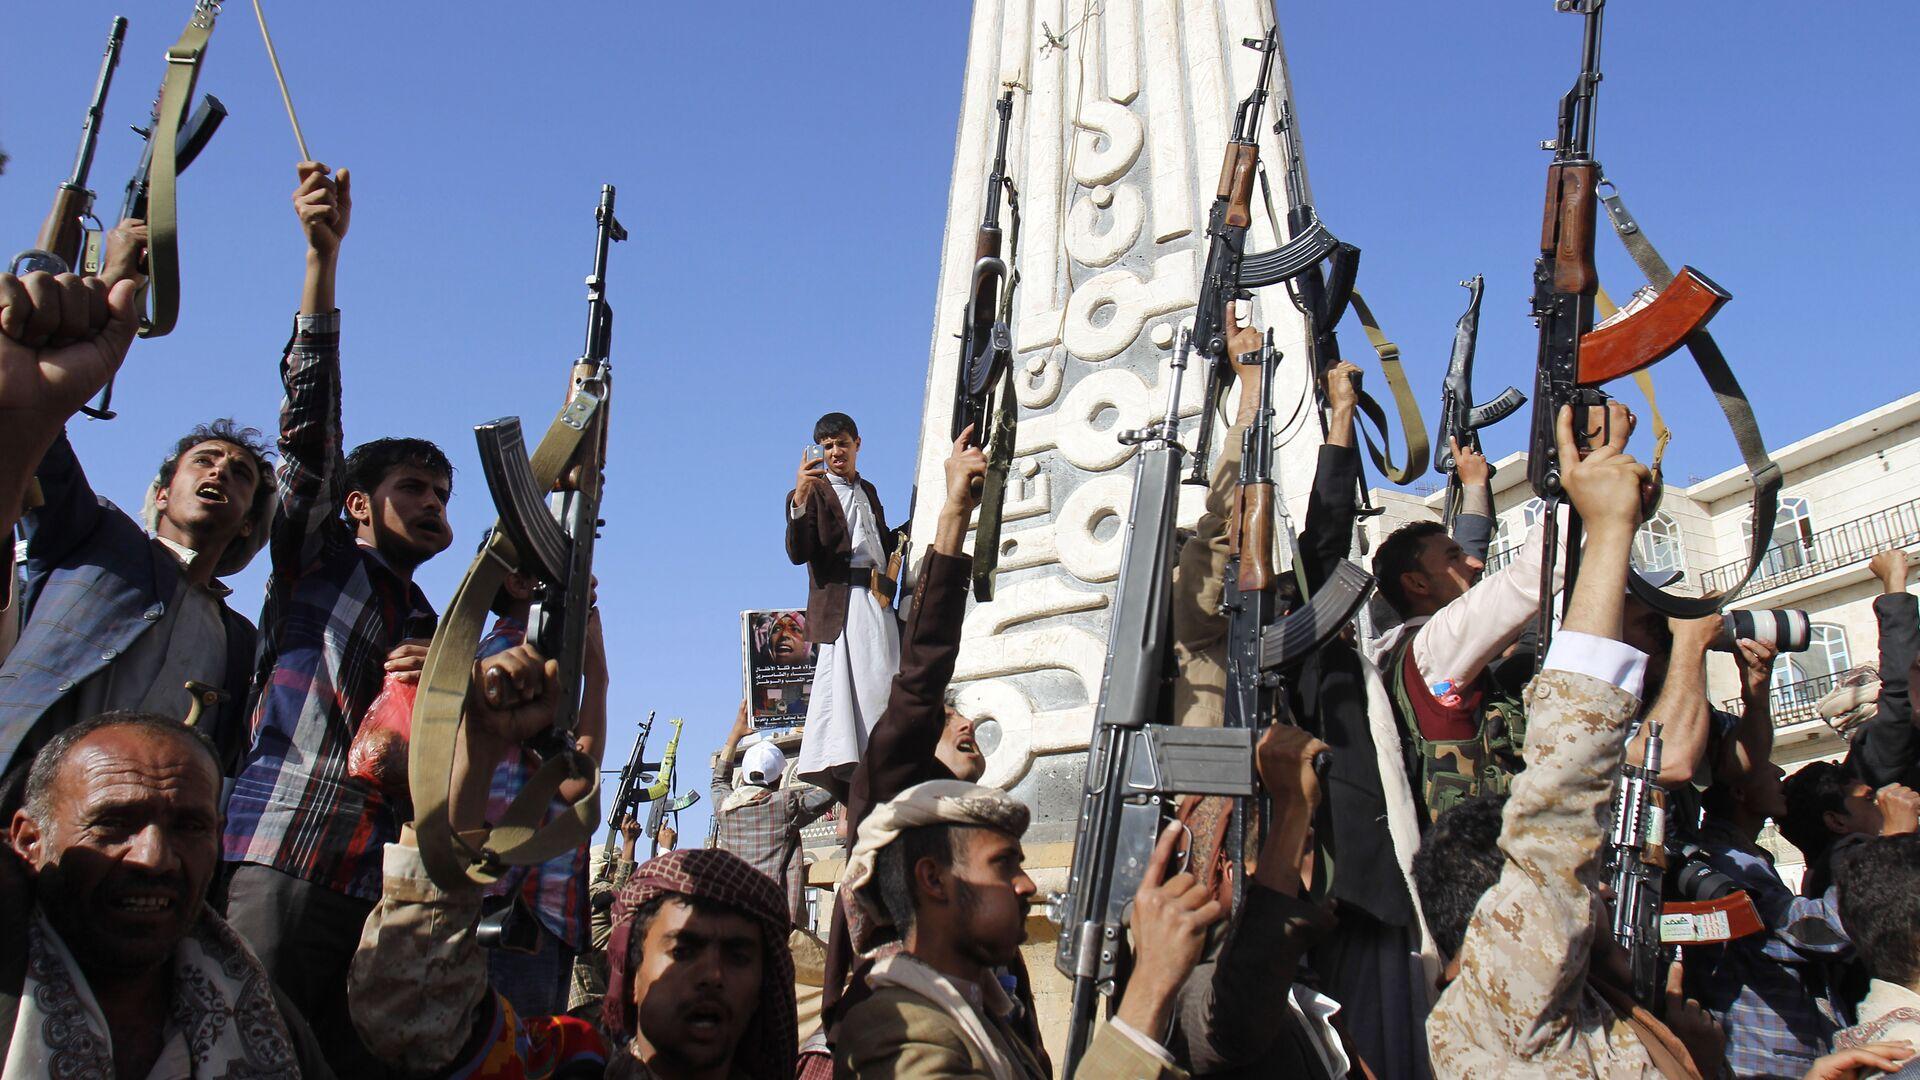 Las fuerzas hutíes en Yemen - Sputnik Mundo, 1920, 01.04.2021